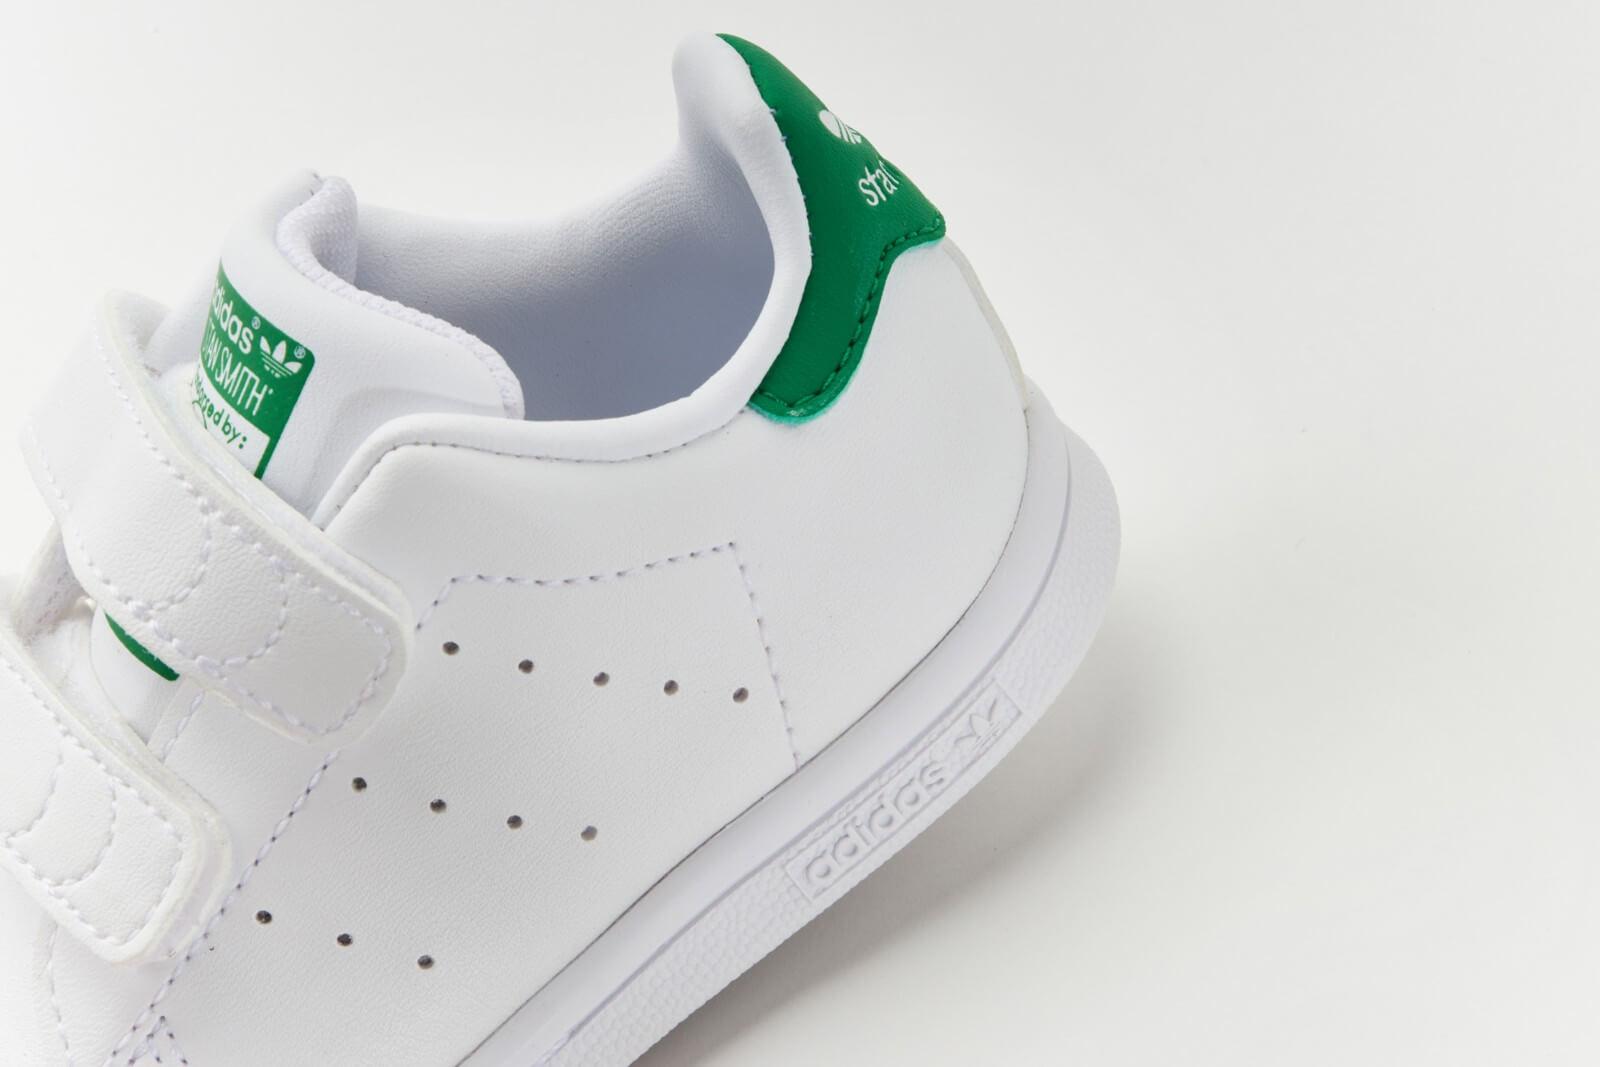 Adidas Stan Smith CF footwear white/scarlet ab 55,71